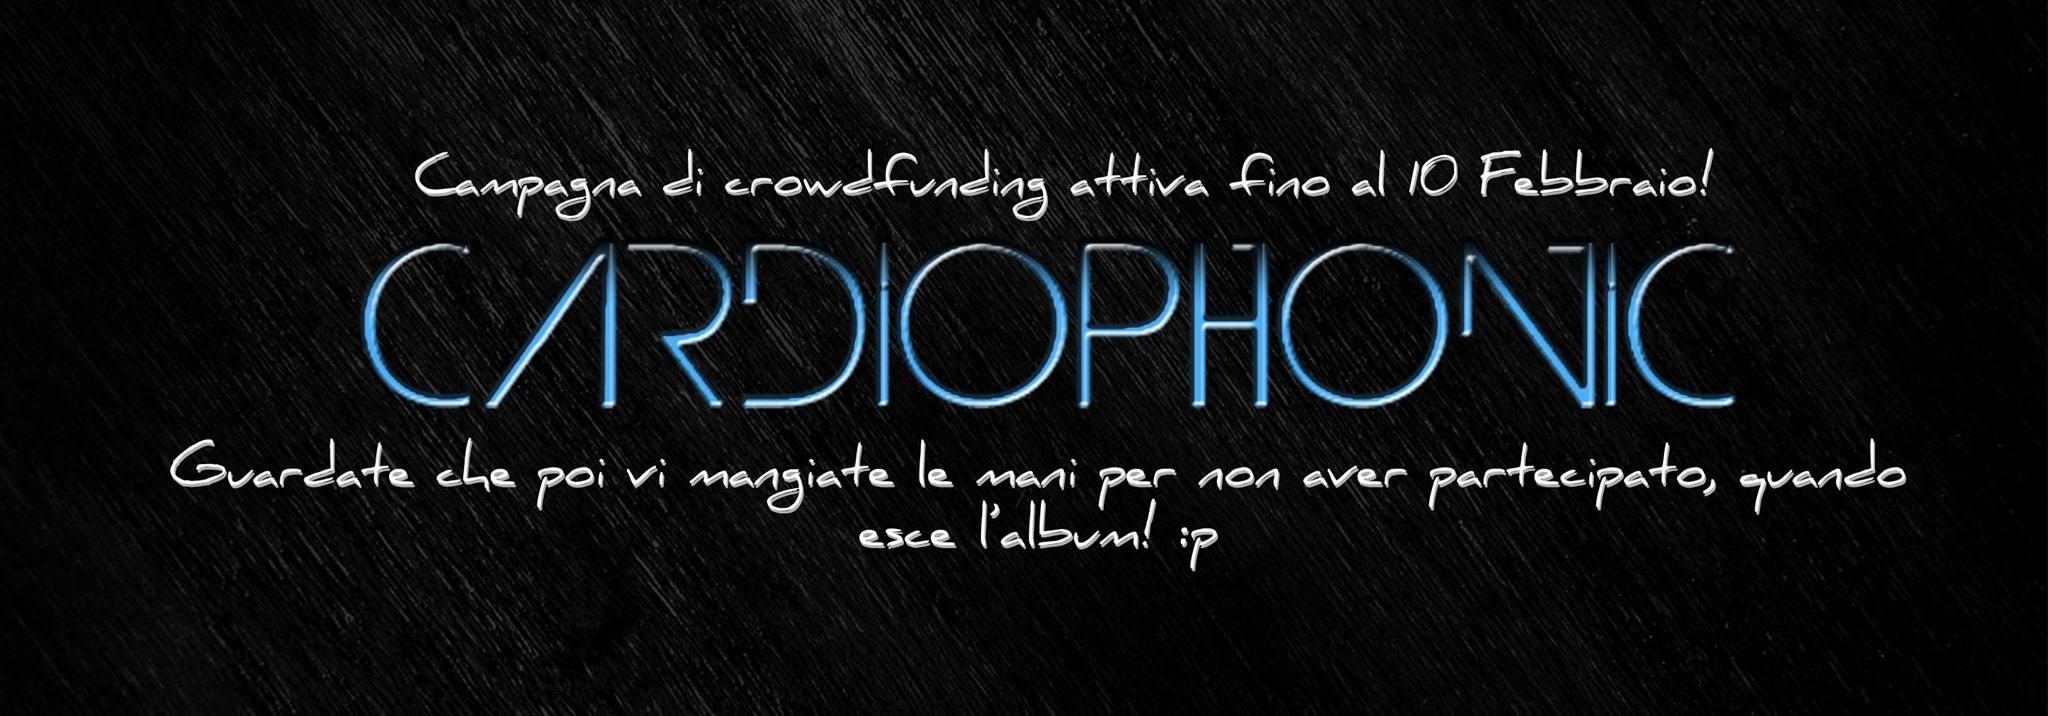 cardiophonic